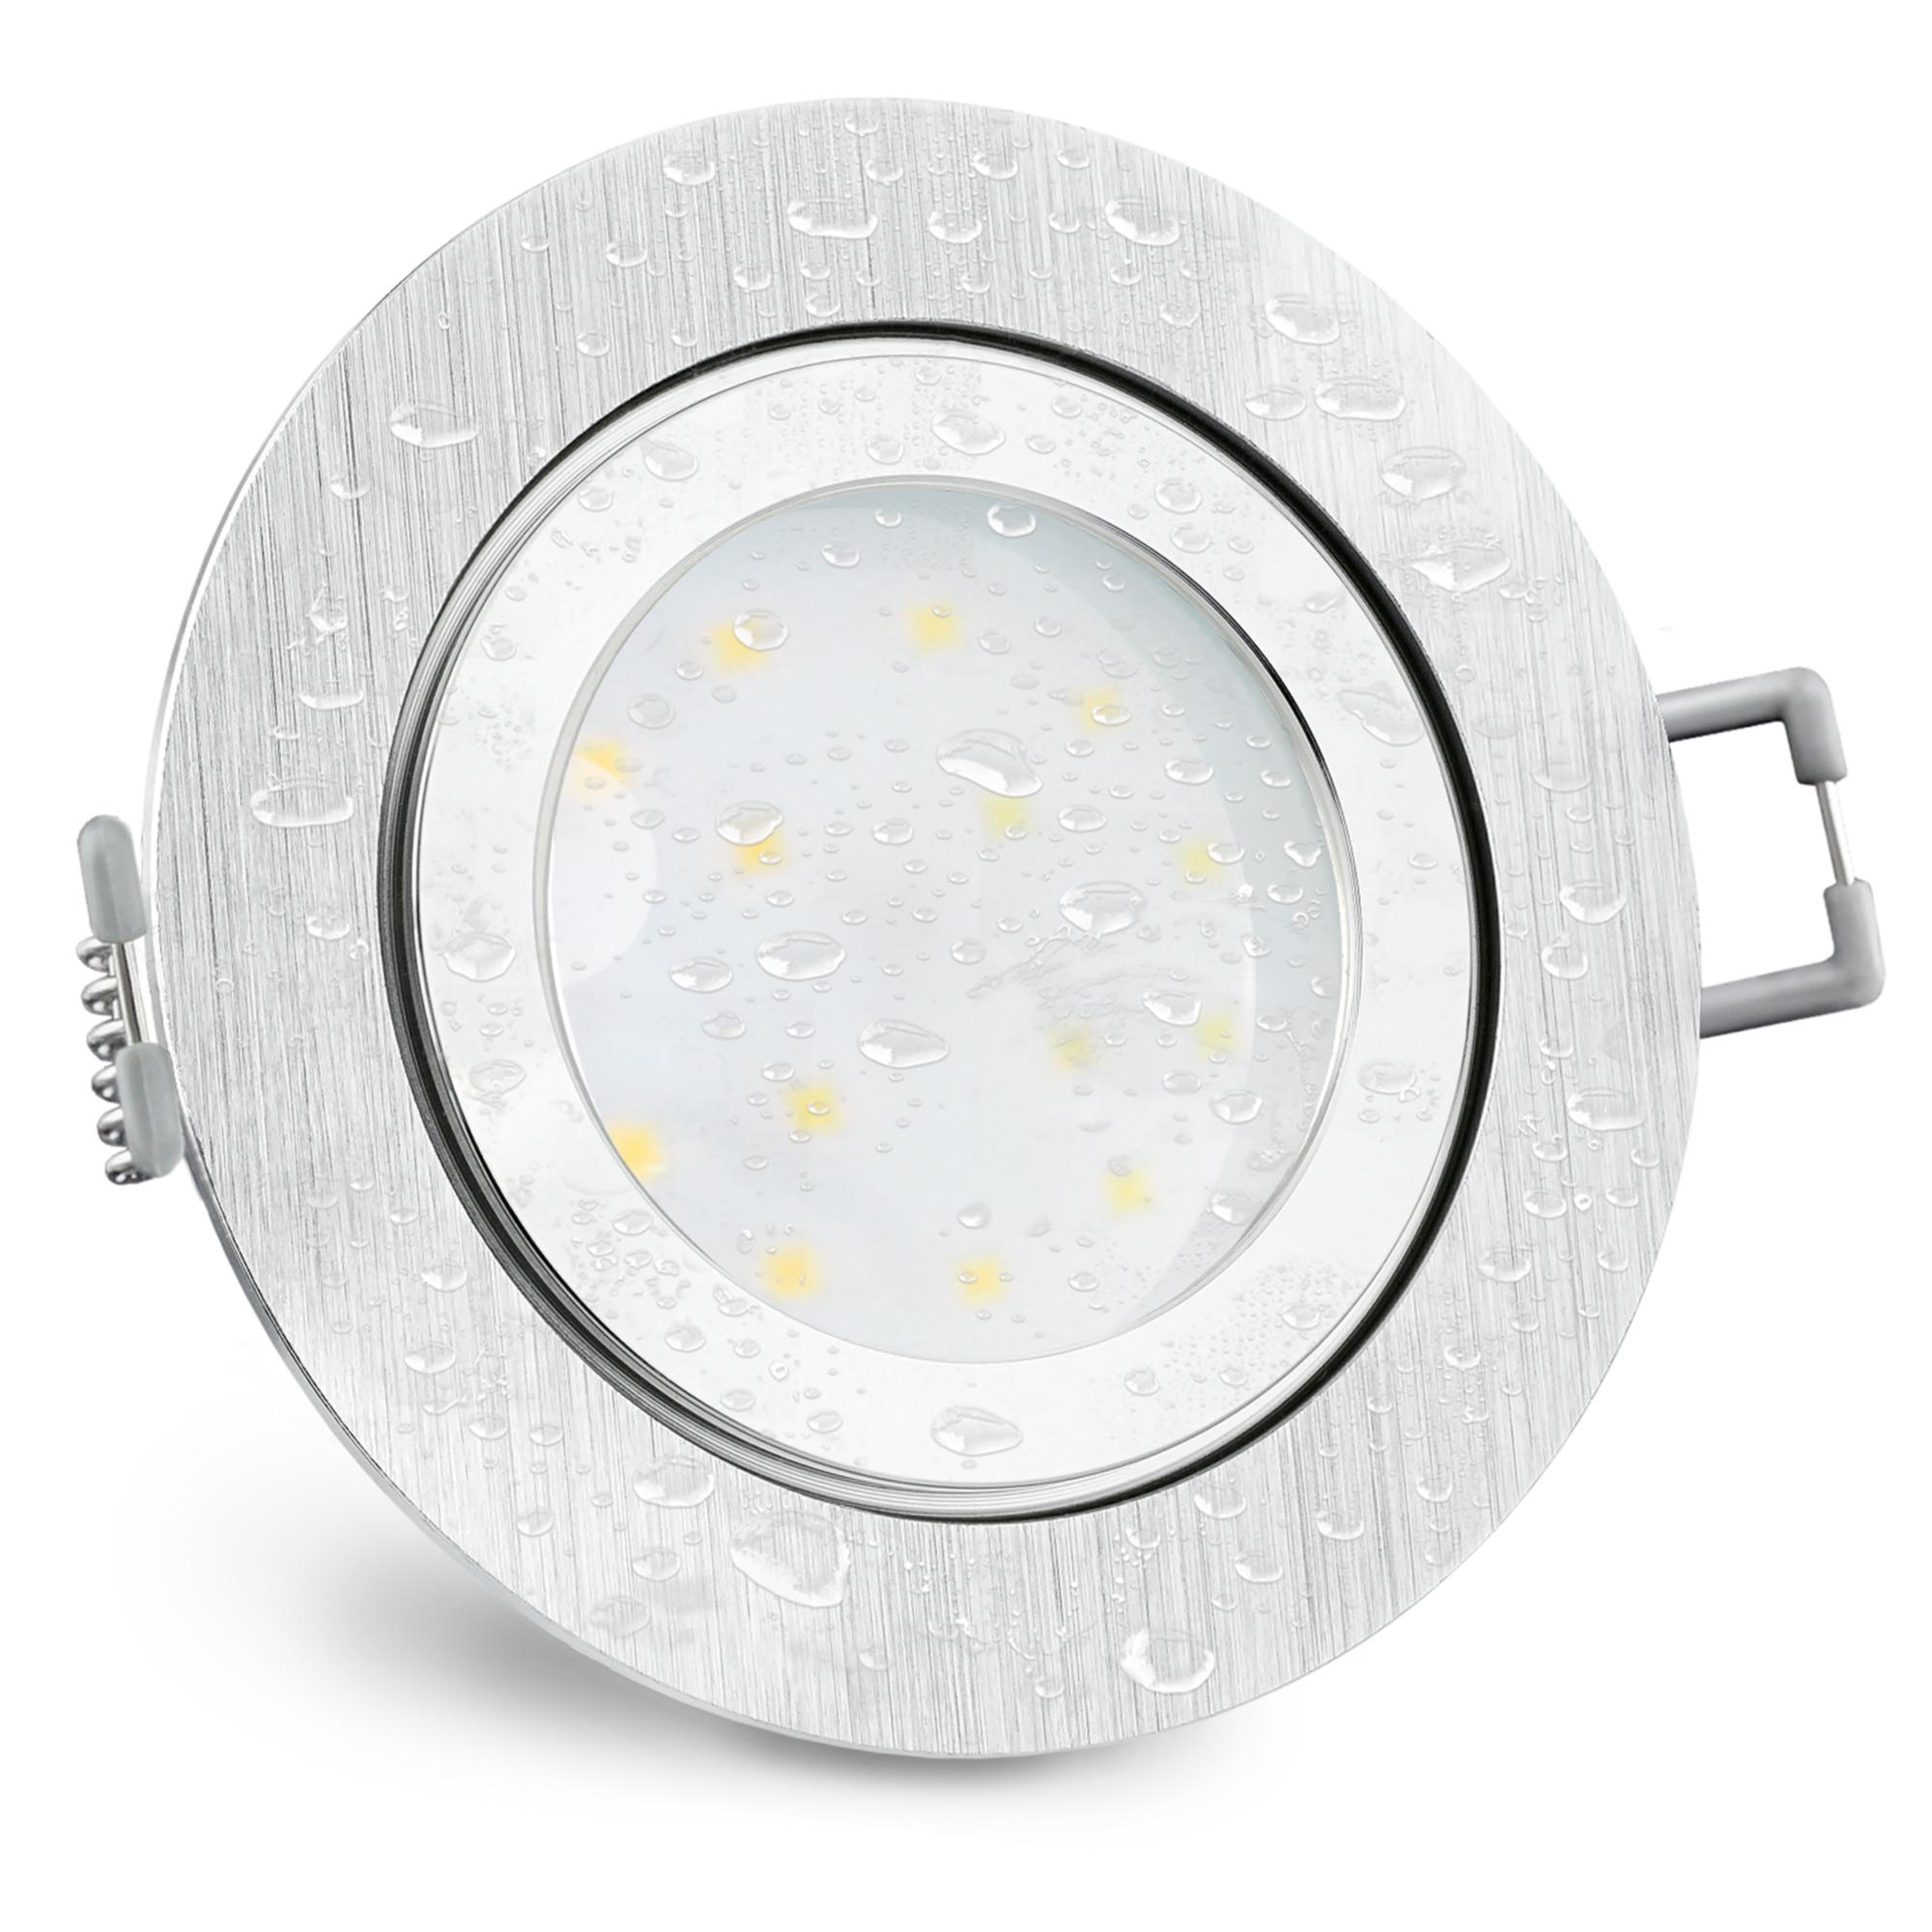 RW 20 flacher LED Bad Einbaustrahler IP20 Alu gebürstet rund inkl. LED Modul  2030V 20W neutralweiß